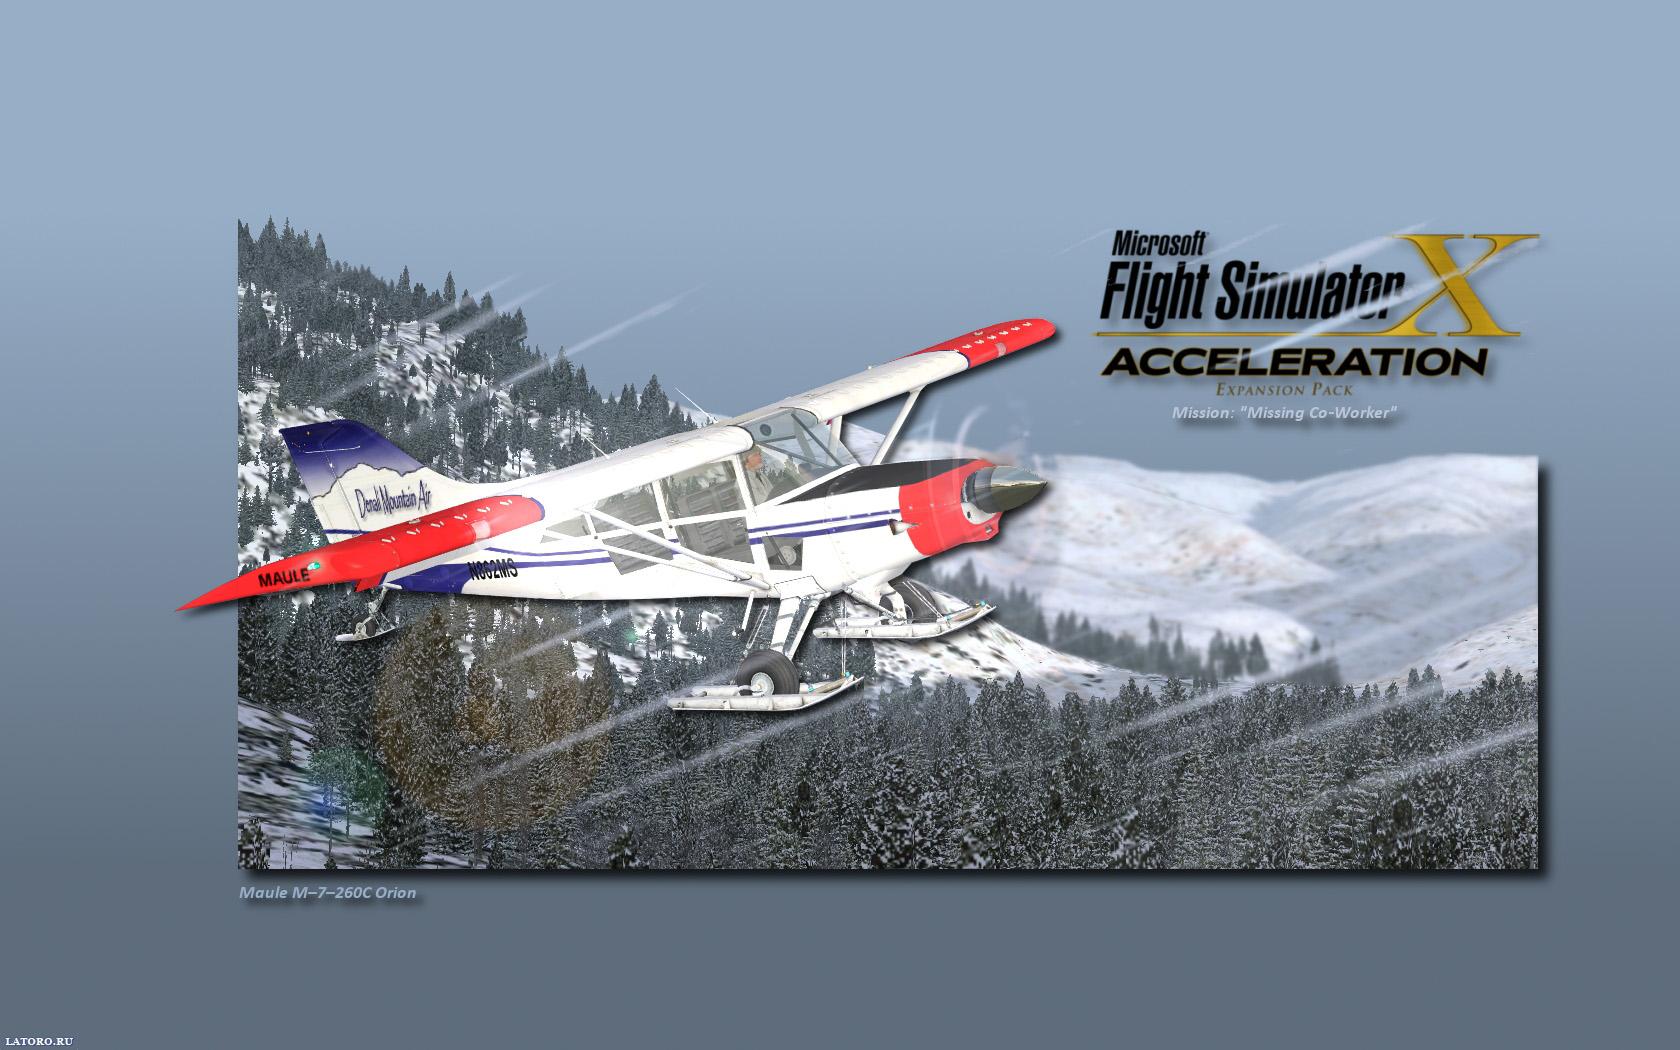 Flight Simulator X Desktop Wallpapers FREE on Latorocom 1680x1050